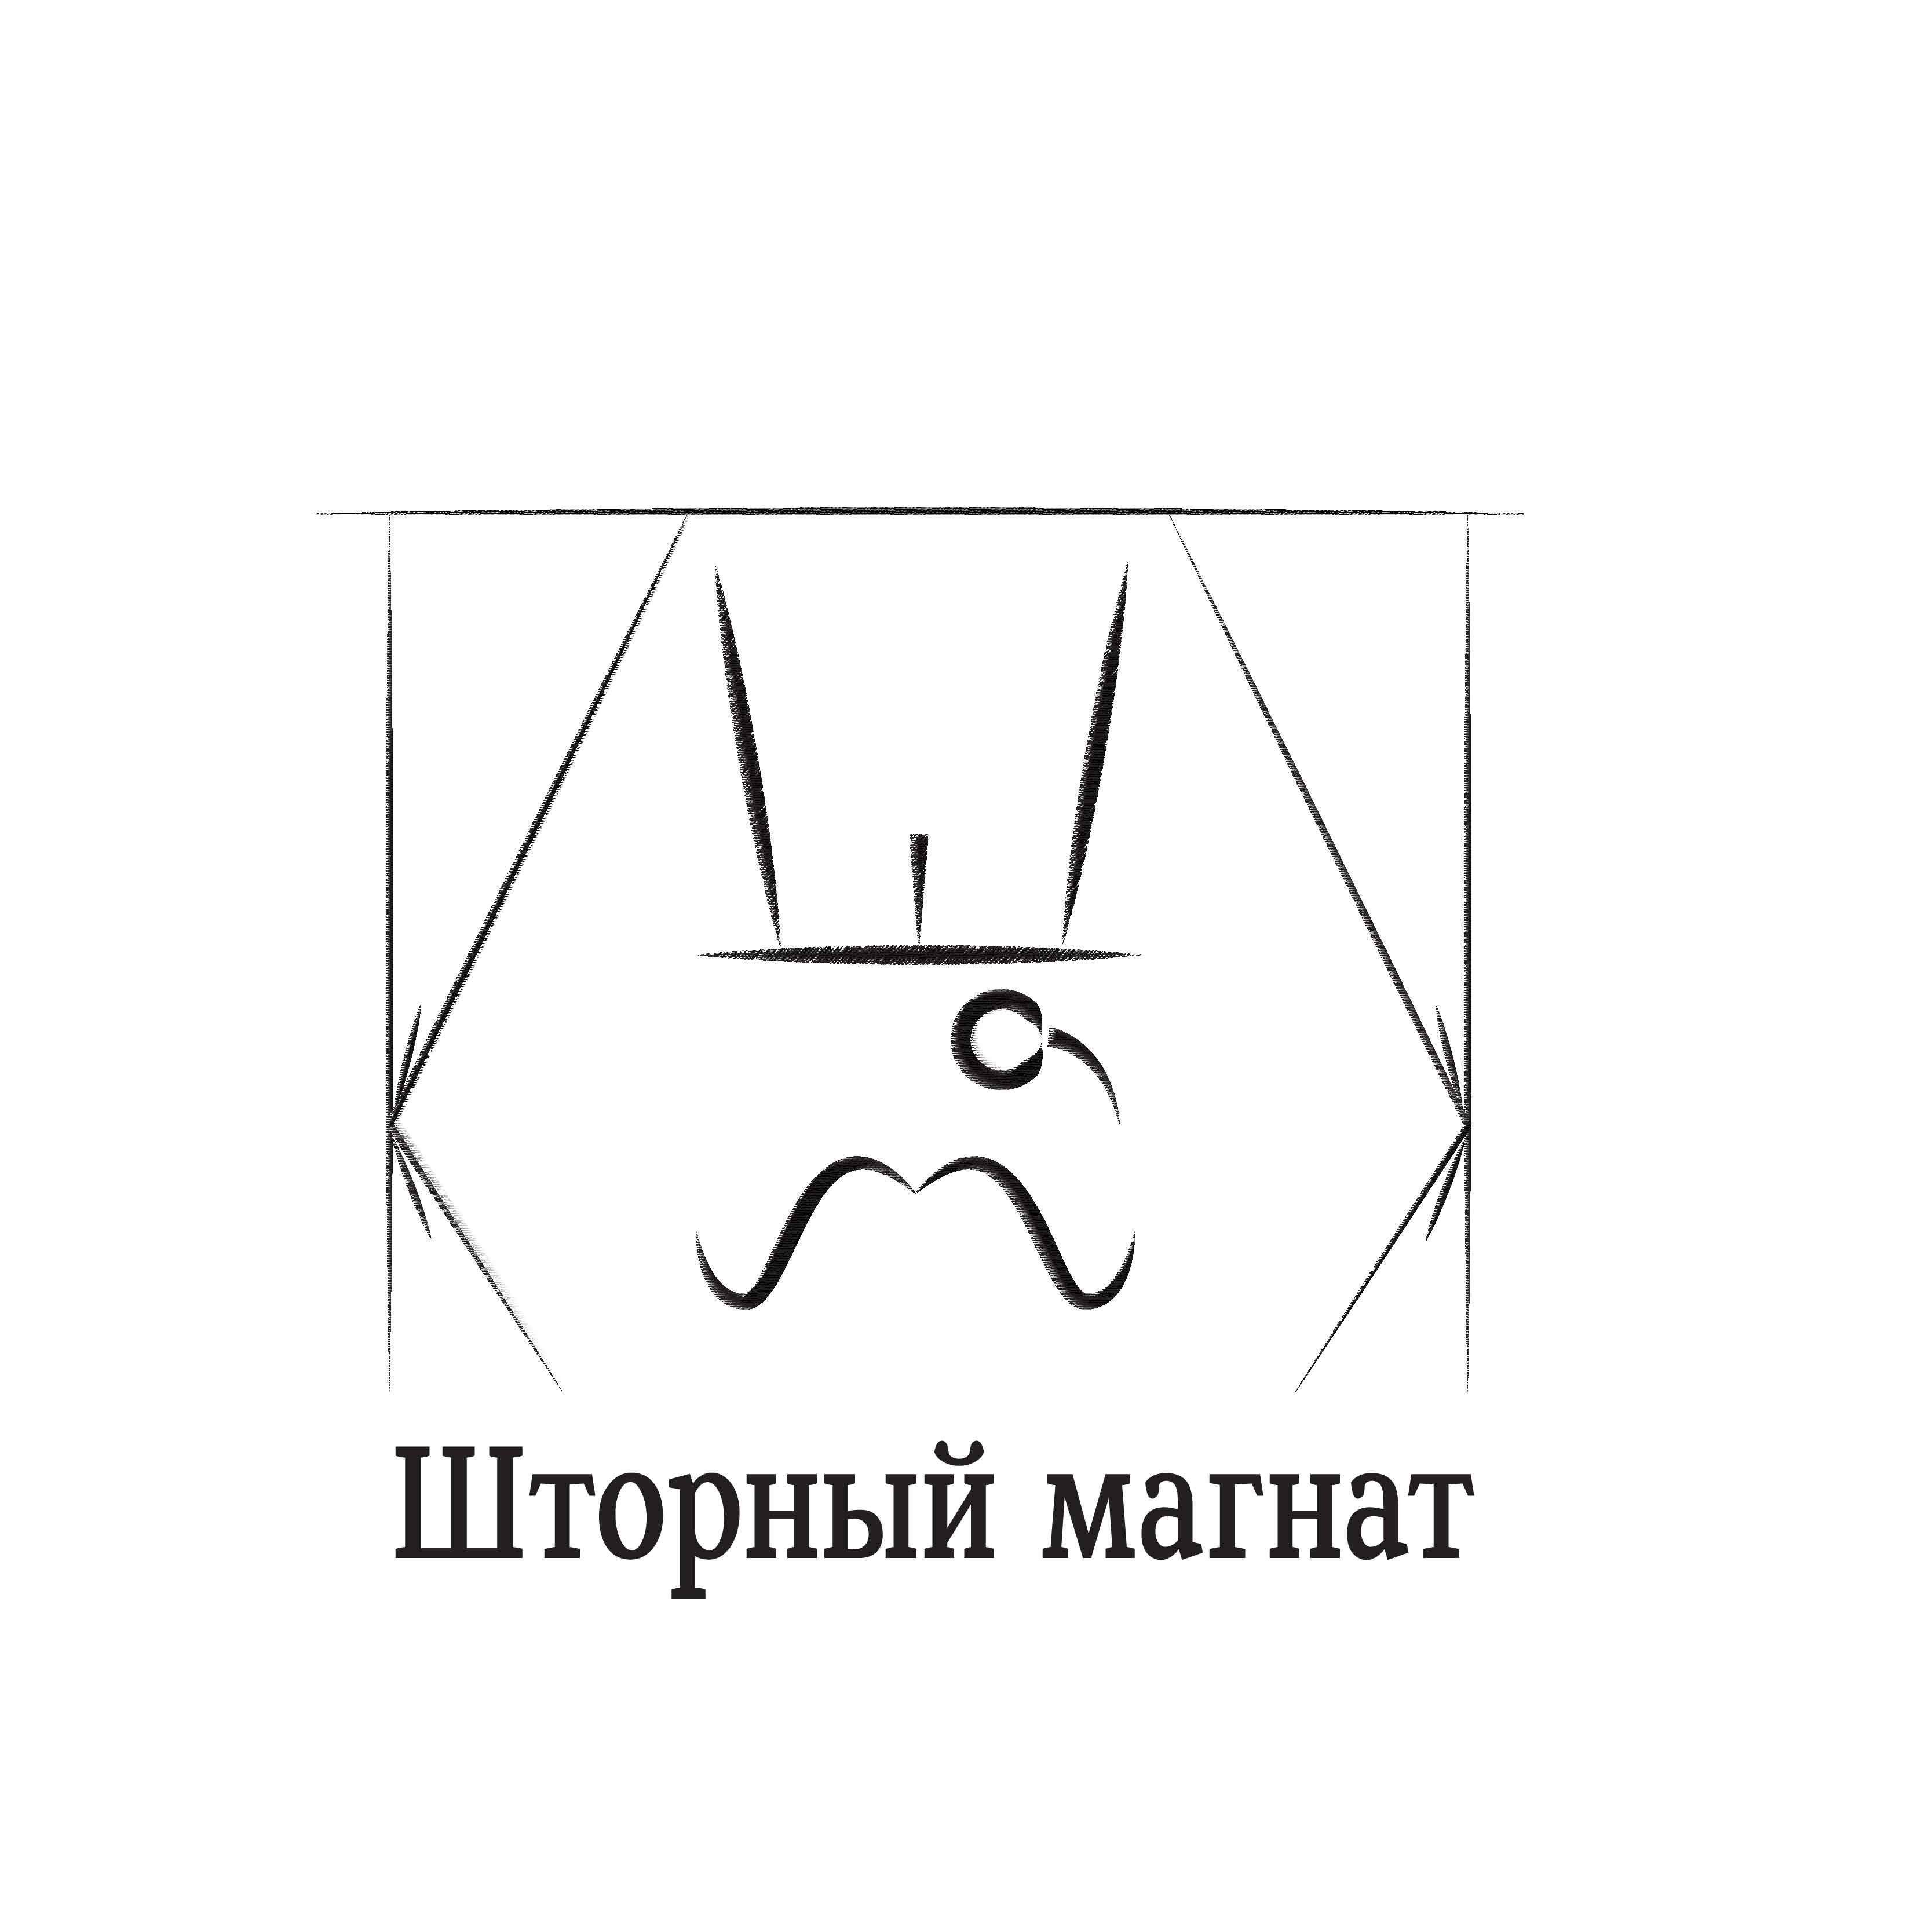 Логотип и фирменный стиль для магазина тканей. фото f_7035cda3e6b7a1b0.jpg